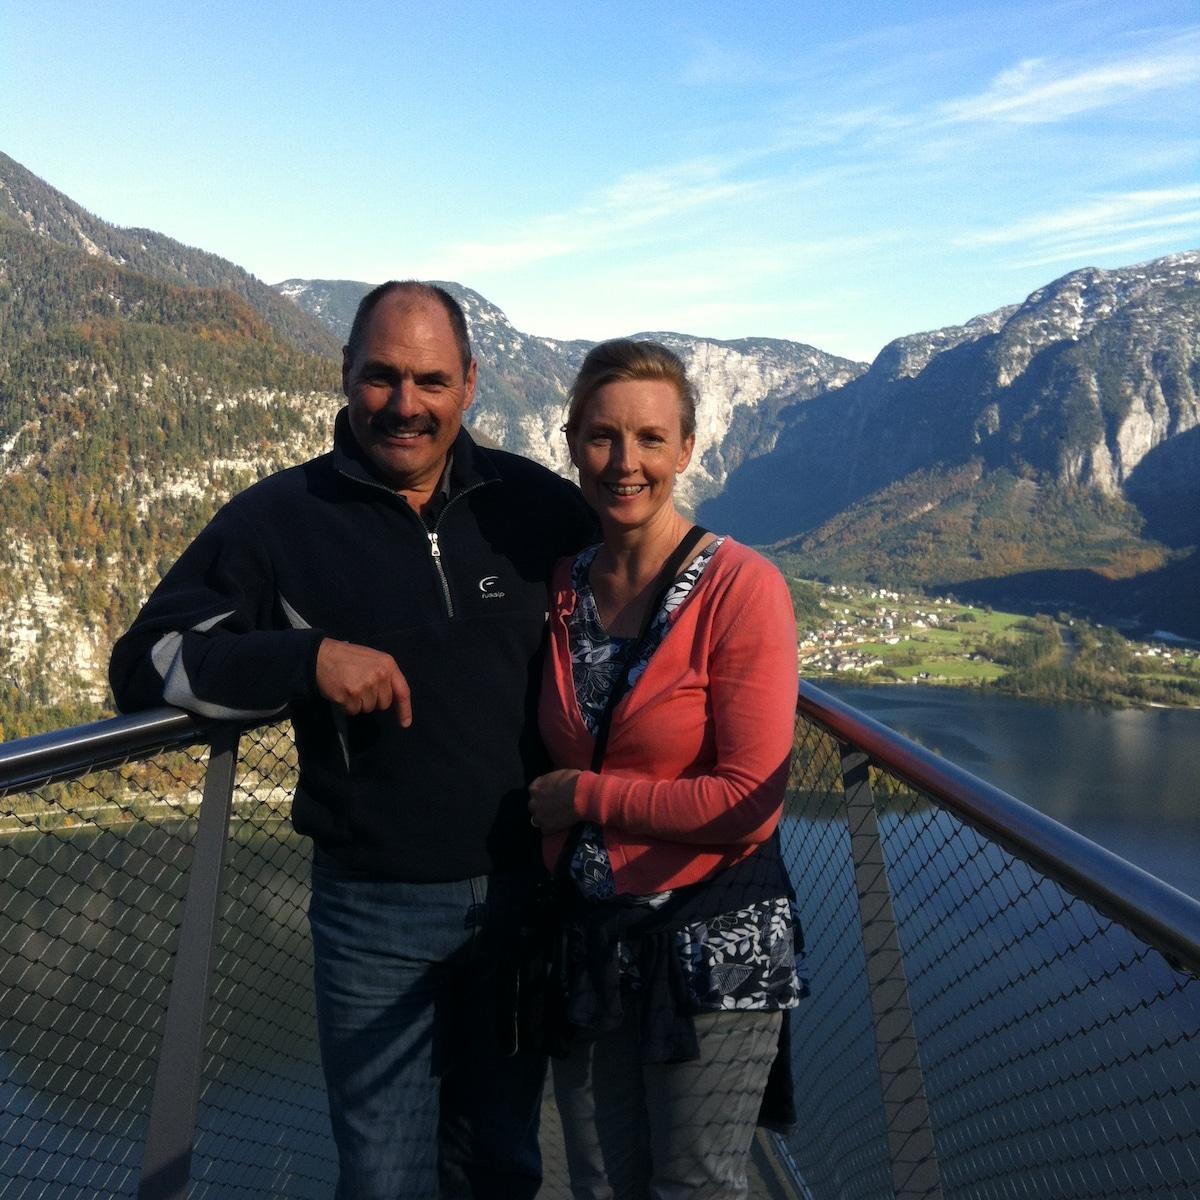 Liz From Obertraun, Austria